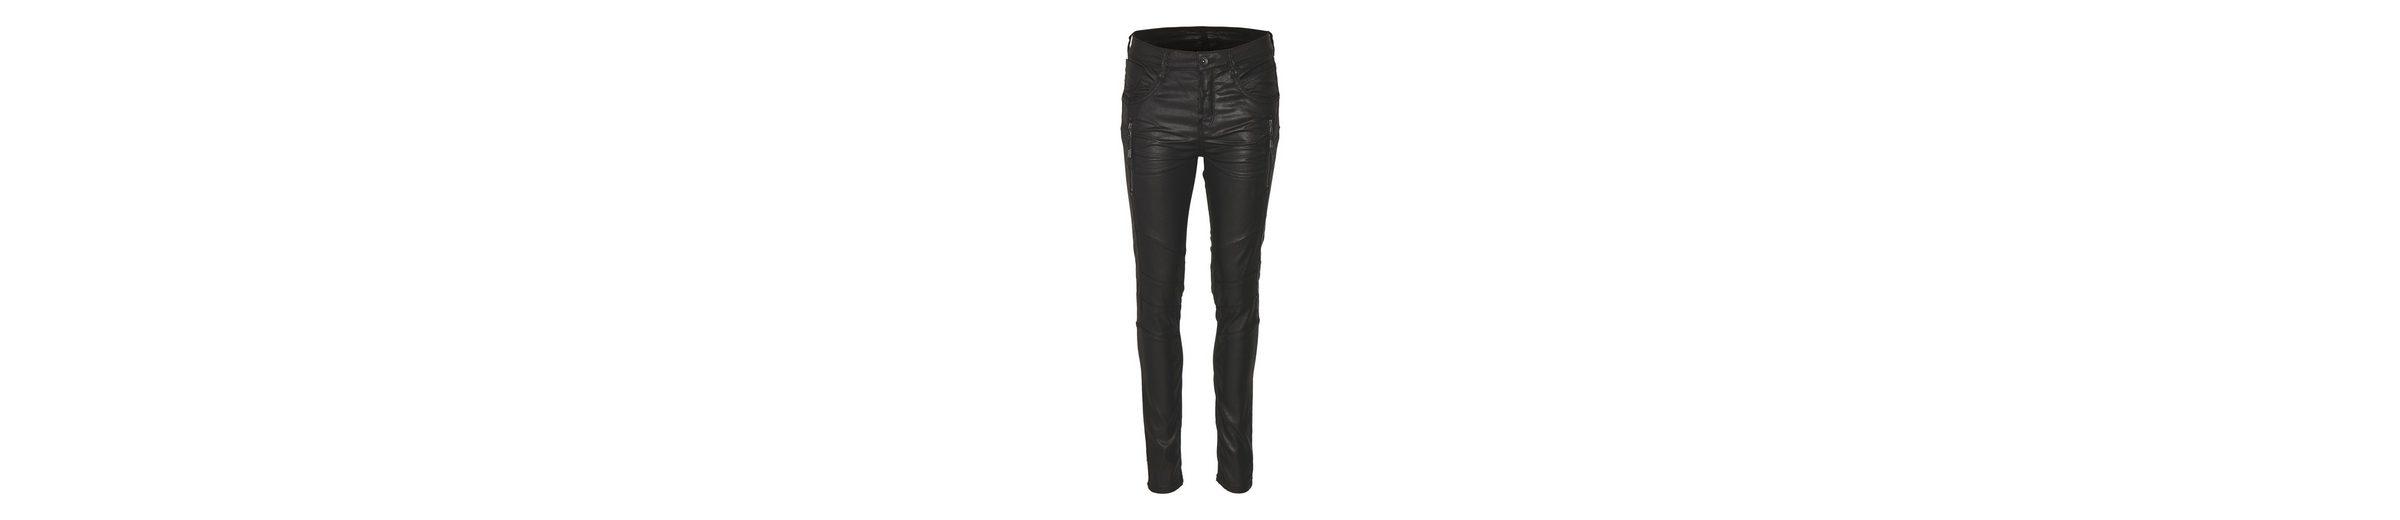 Cream Röhrenjeans Carla coated Jeans Günstiger Versand Billig Besuch Neu Offizielle Günstig Online Ebay Günstiger Preis aVIgtKy6